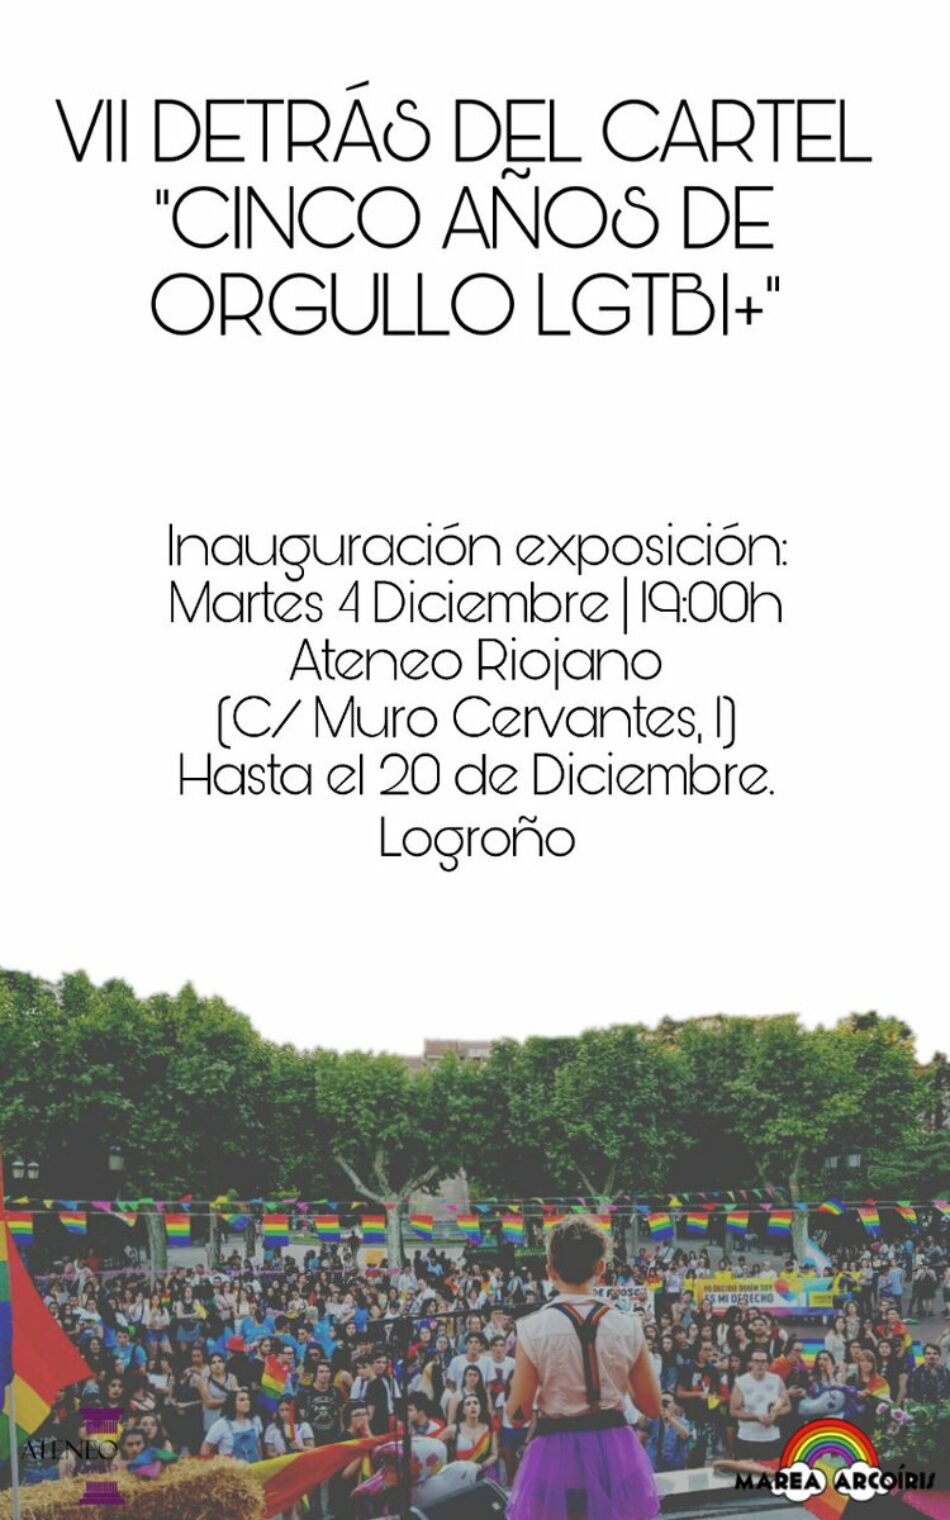 Exposición «Cinco años de orgullo LGTB+»